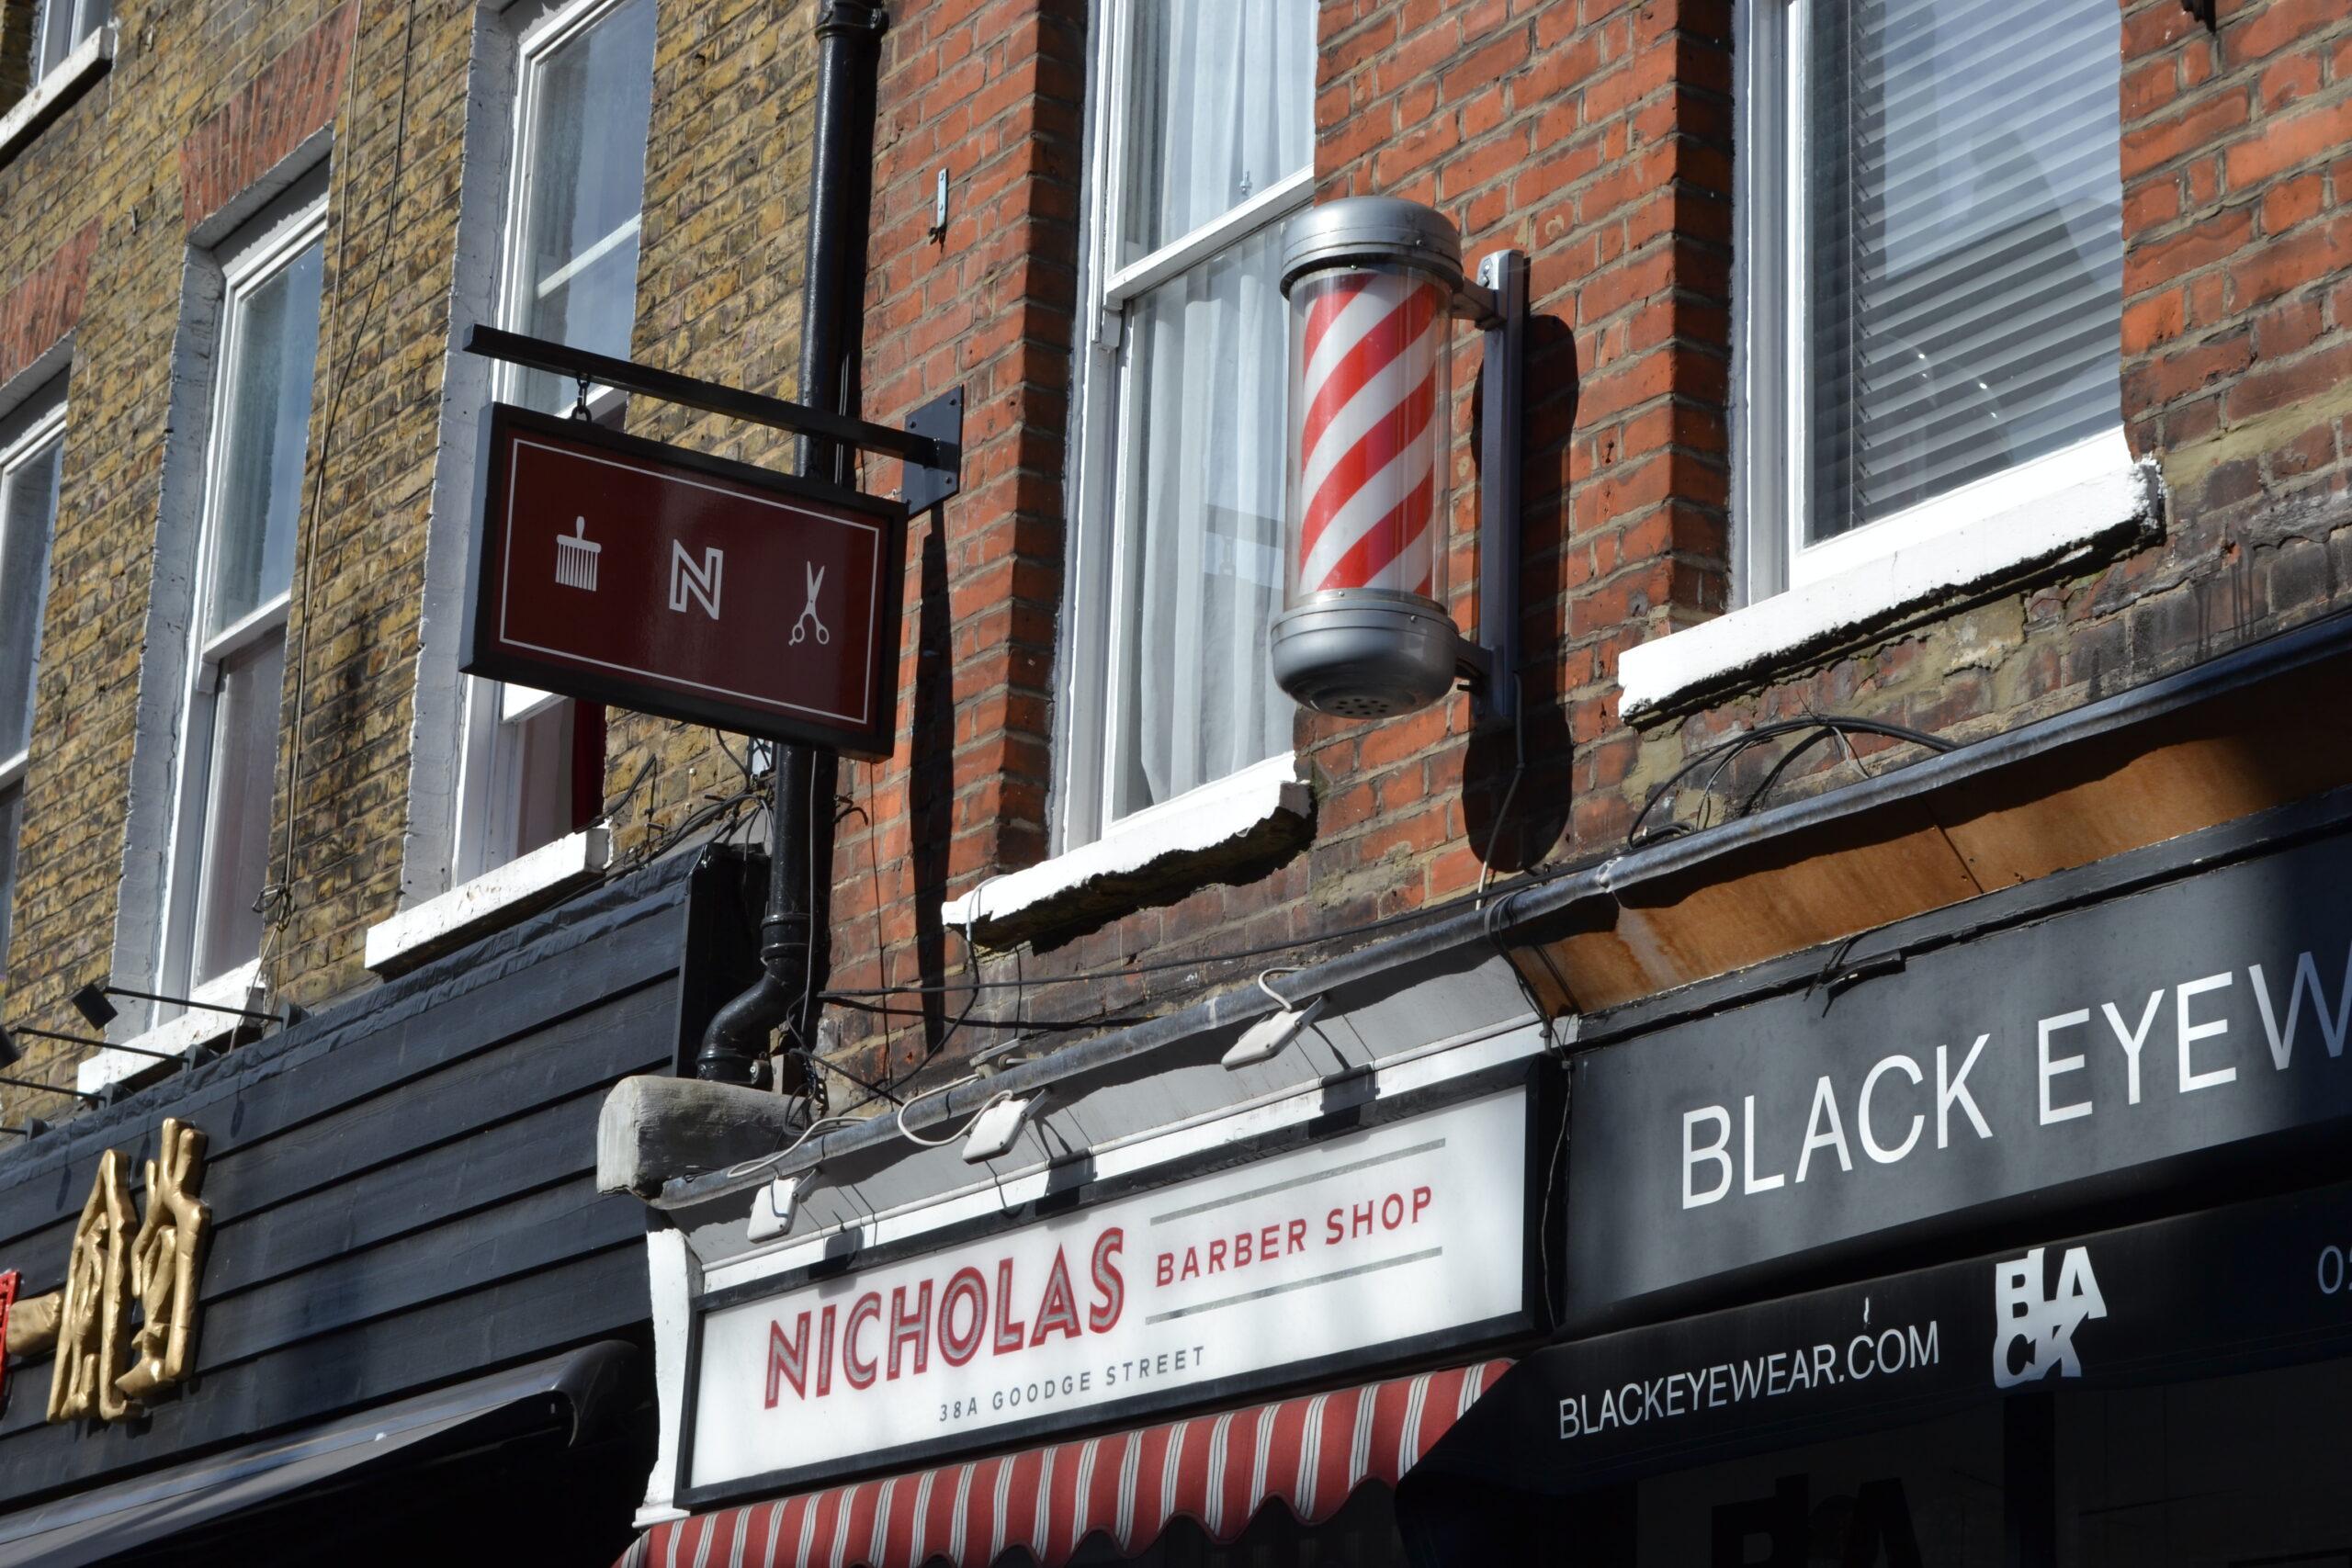 Shop signs on Google Street